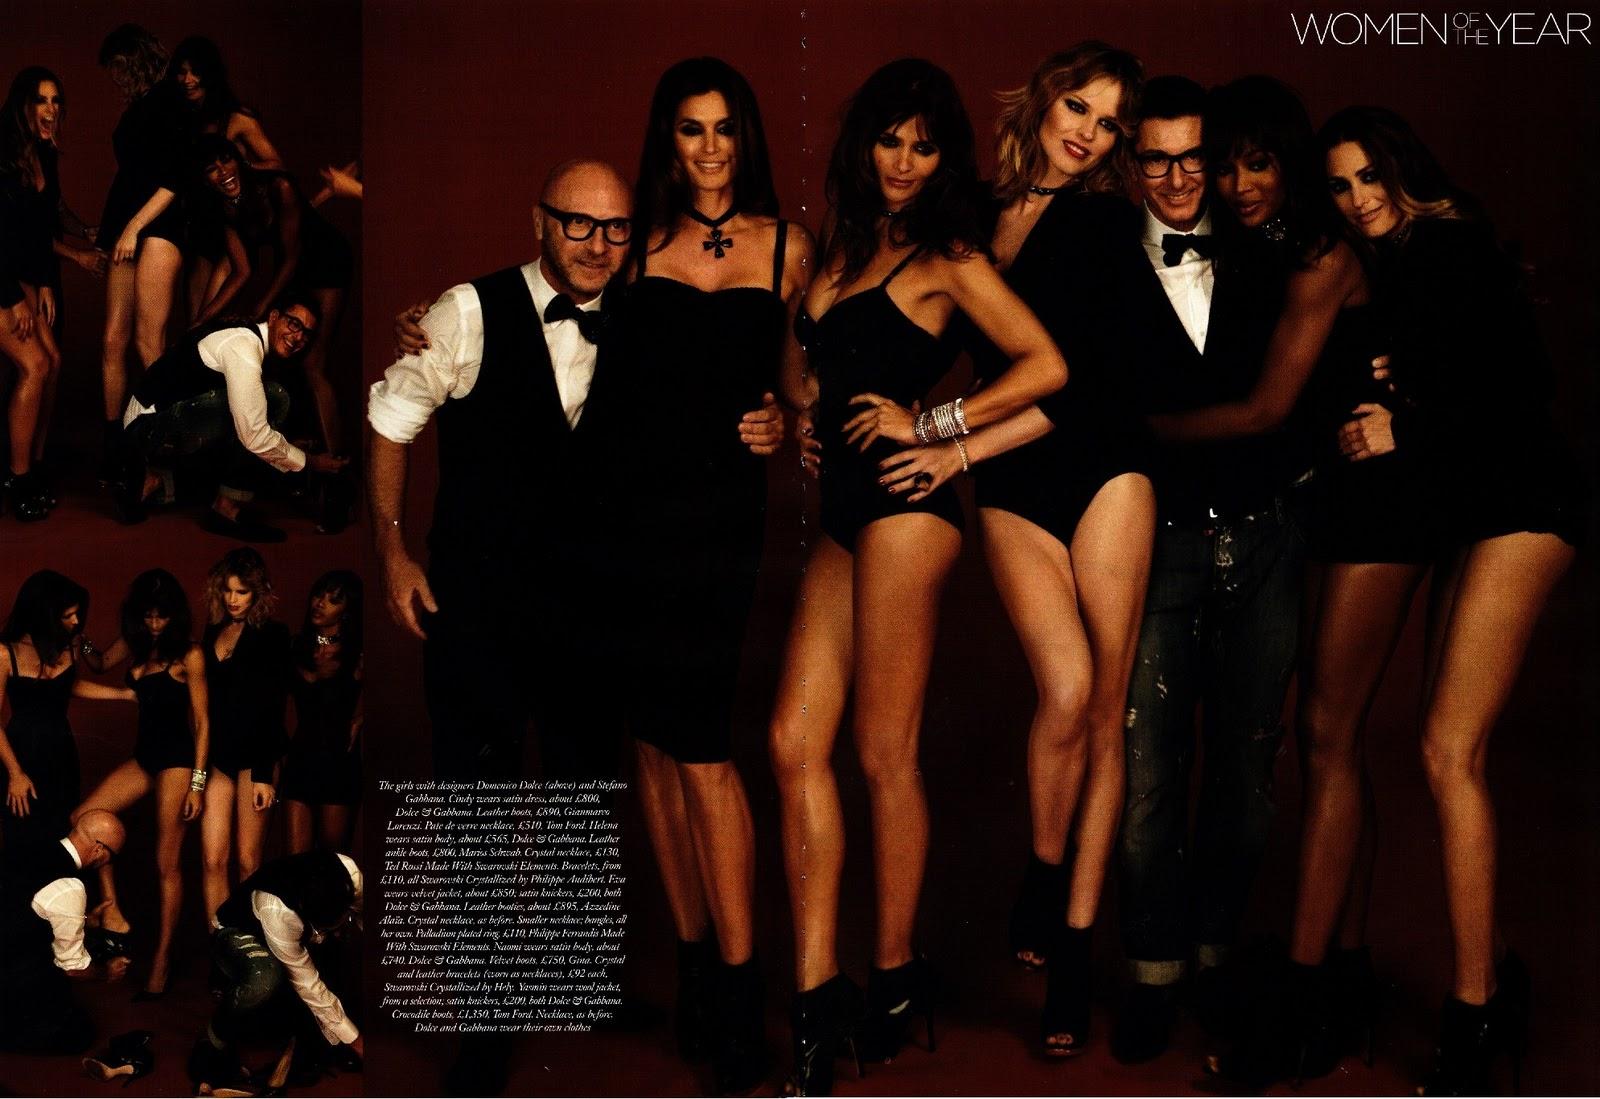 http://1.bp.blogspot.com/-qKQmh-HLoQE/Trr9XLmGG2I/AAAAAAAAI2E/o_XX-6RQ0qQ/s1600/Cindy+Crawford%252C+Helena+Christensen%252C+Naomi+Campbell%252C+Eva+Herzigova%252C+Yasmin+Le+Bon+-+Lights%252CCamera%252CAction.jpg